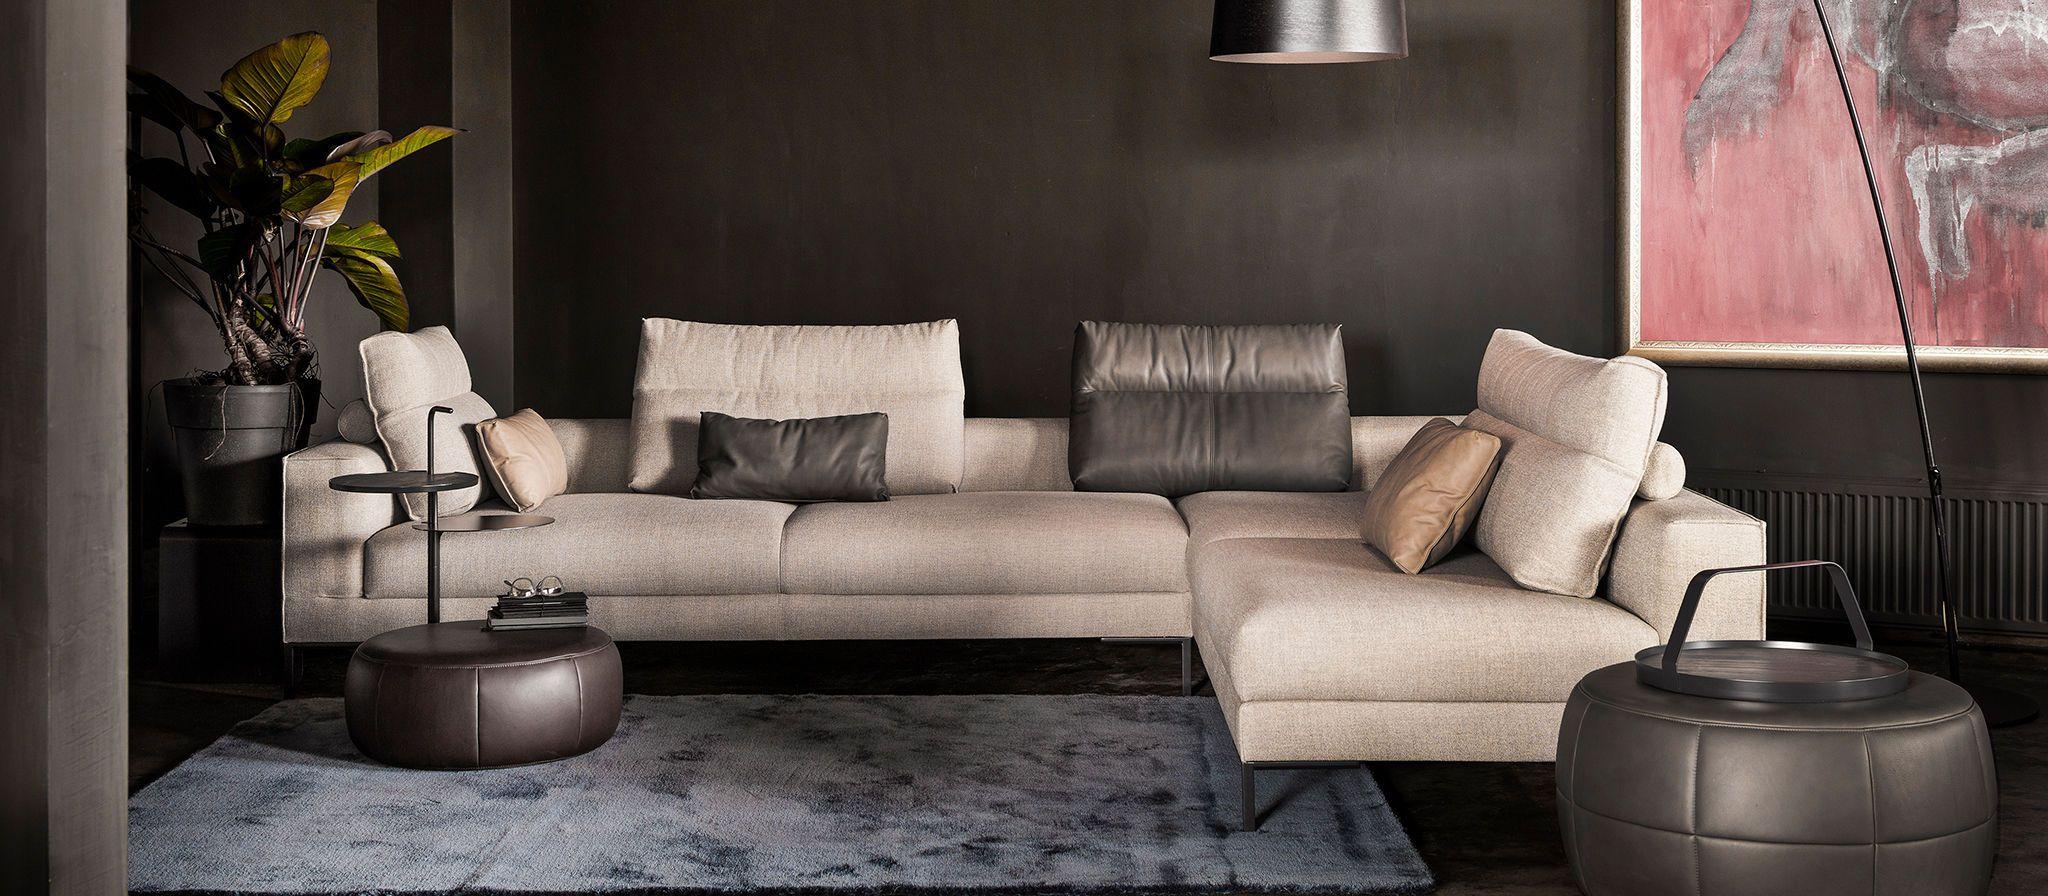 Design On Stock Aikon.Aikon Lounge Hoekopstelling Design Marike Andeweg Voor Design On